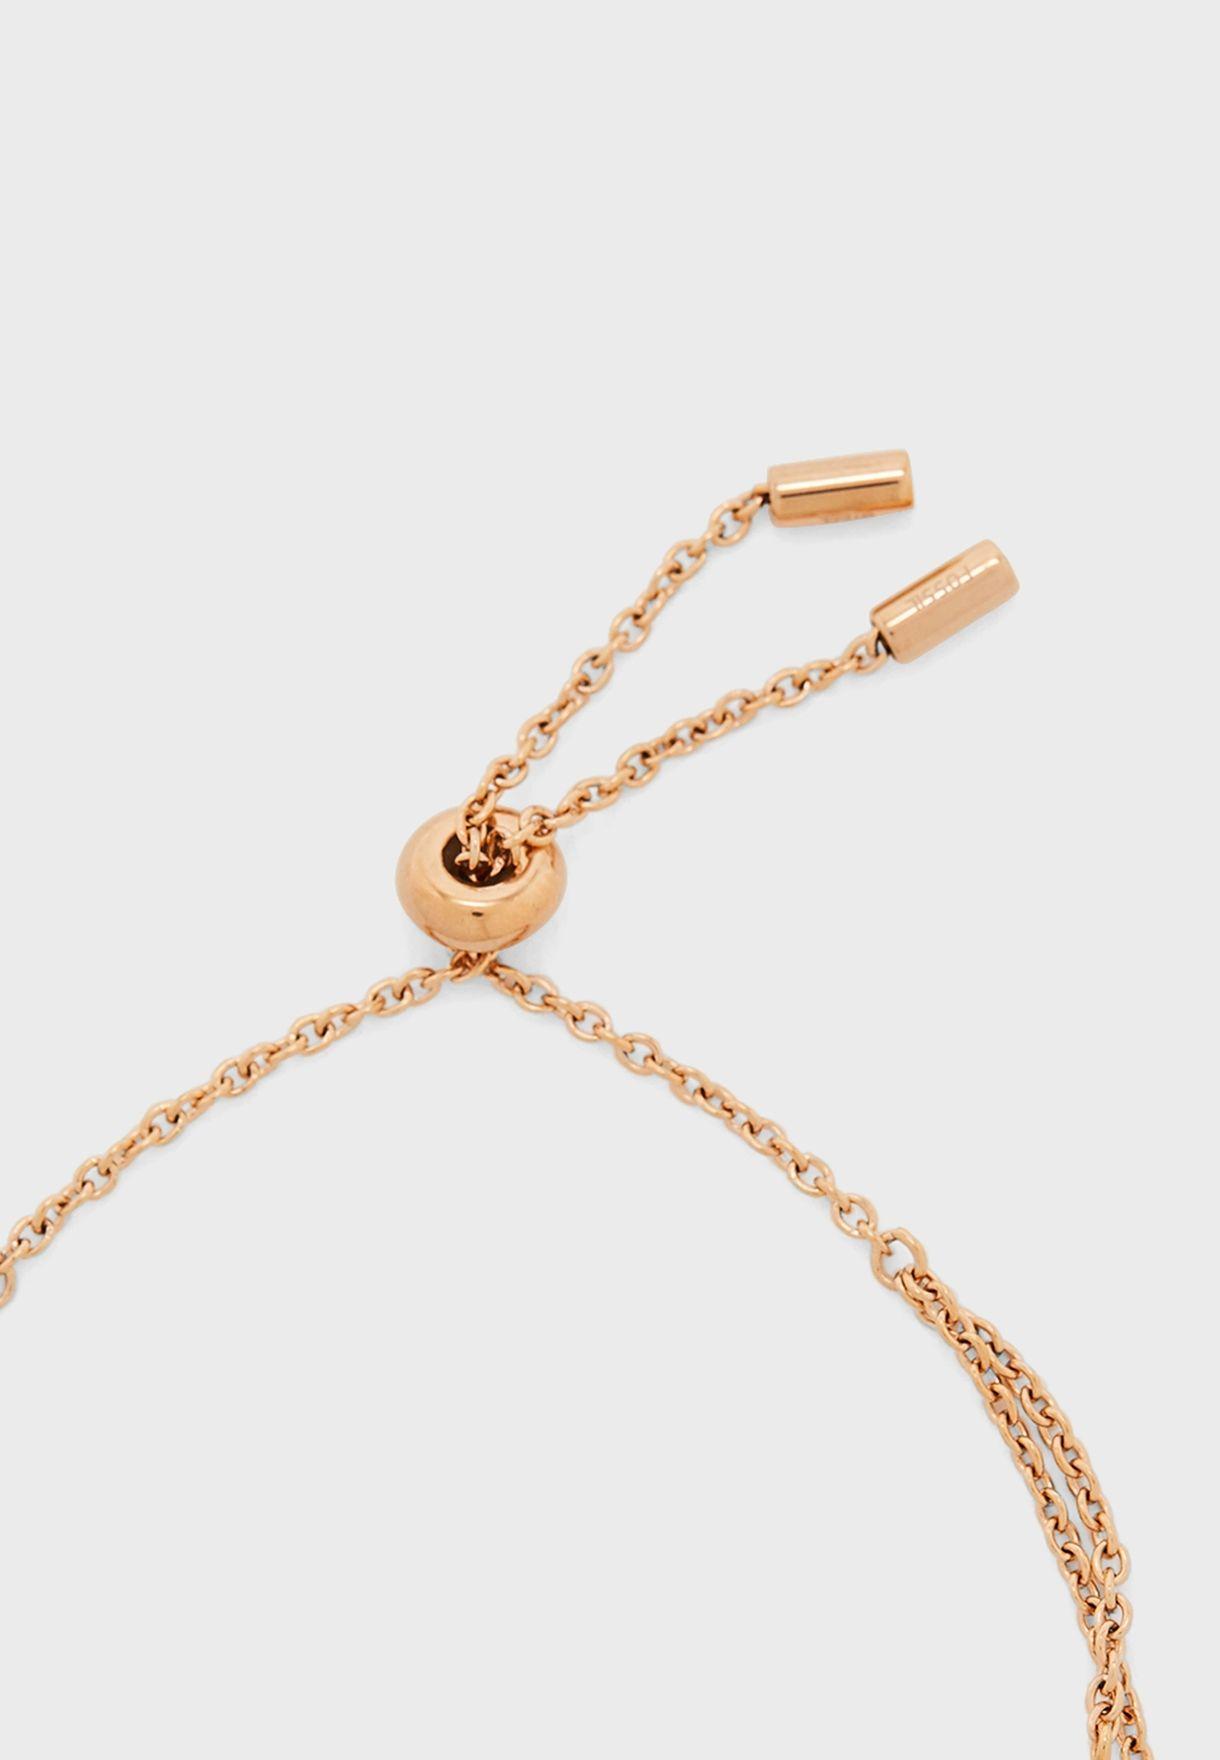 Iconic Vintage Motif Bracelet